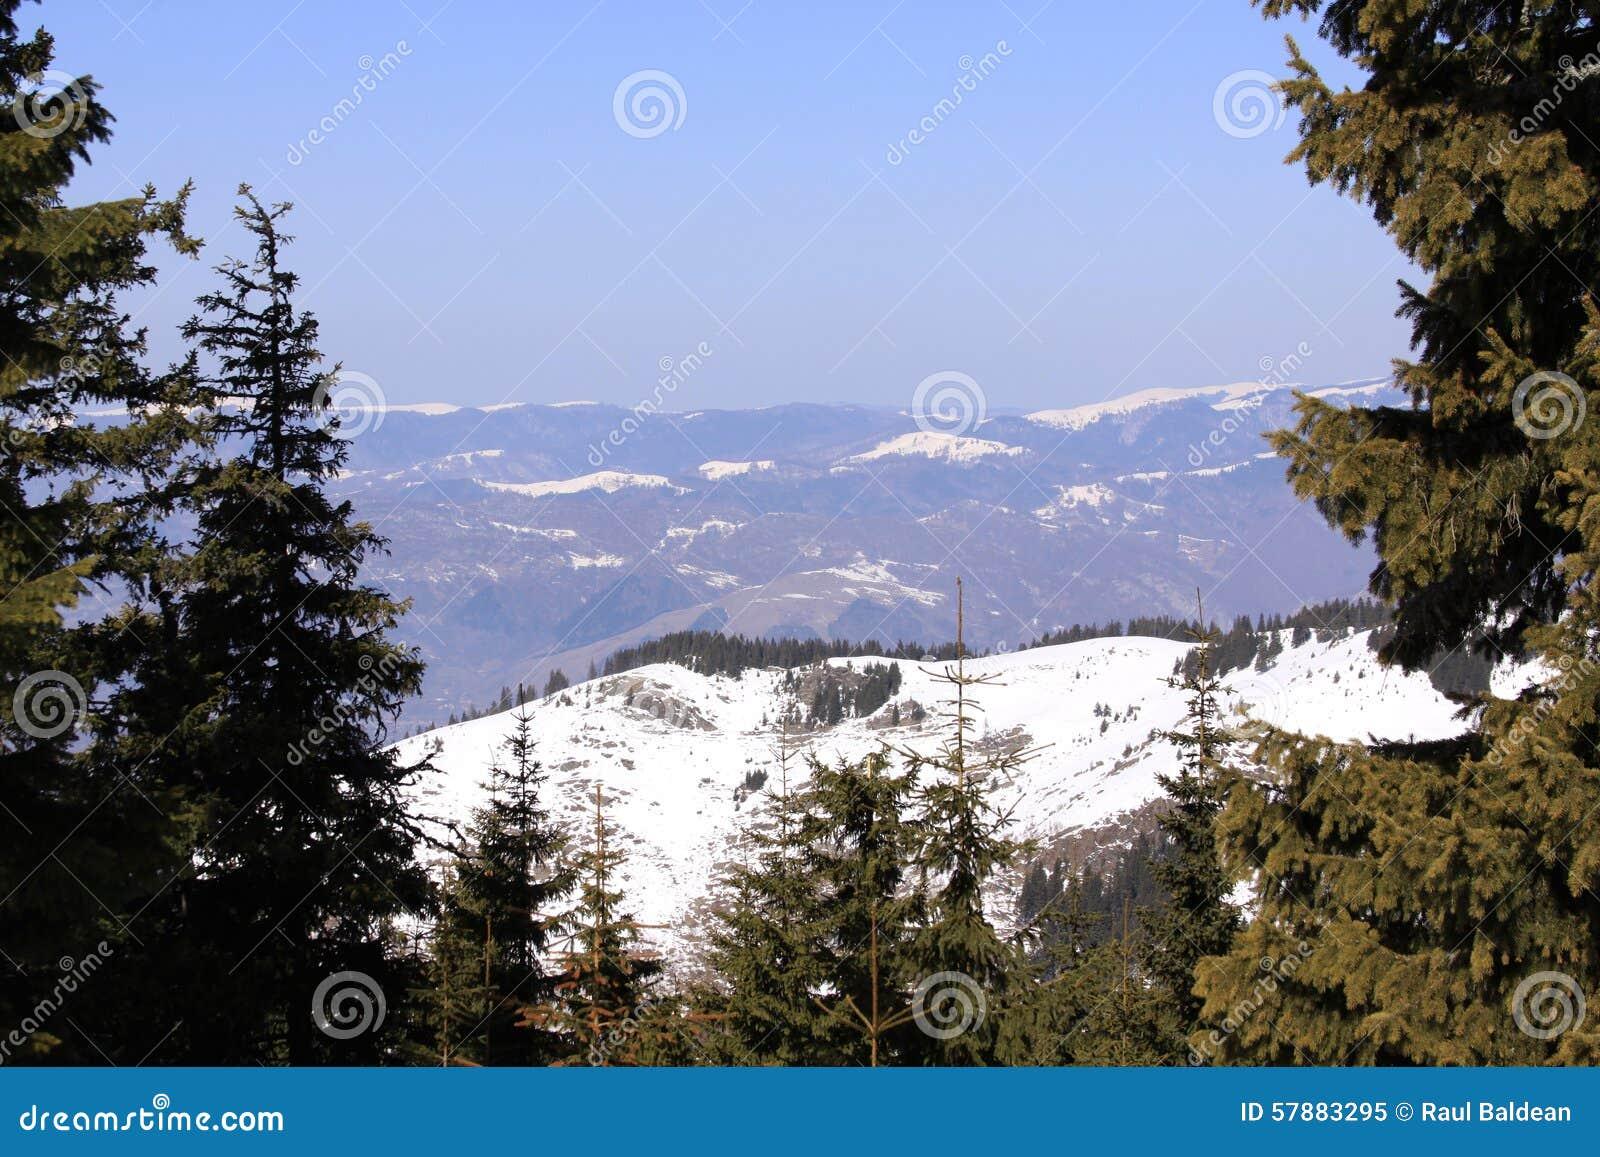 Mountains seen between pine trees in winter